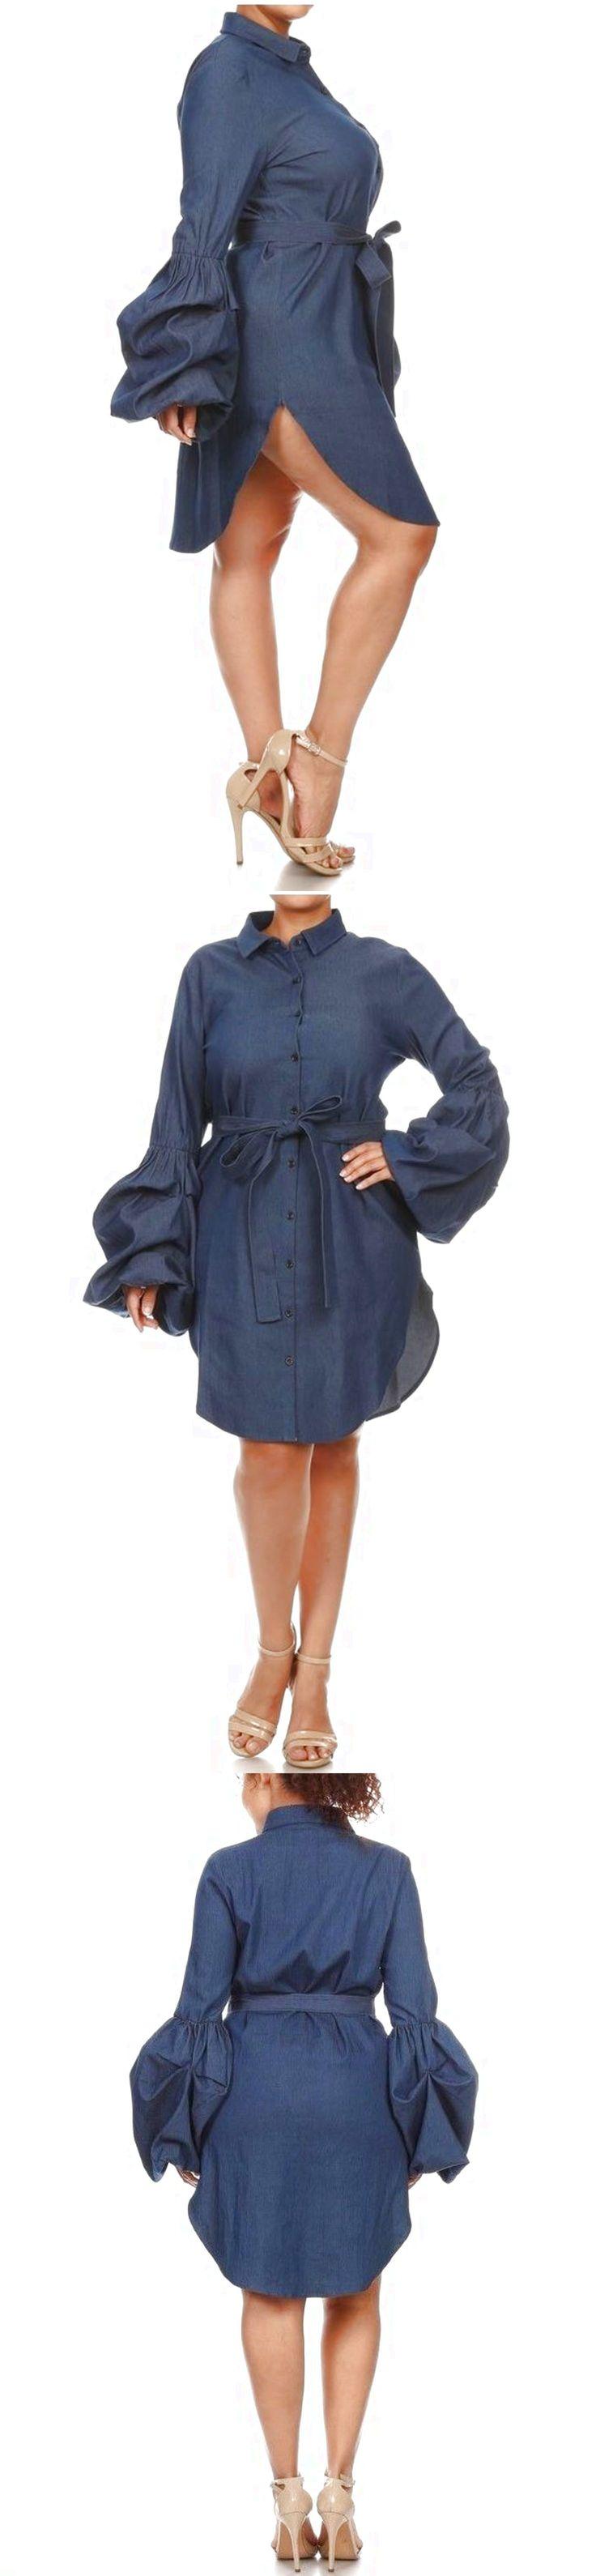 Plus Dark Blue Puff Bell Sleeve Denim Shirt Dress Jean Tunic Top $59.95